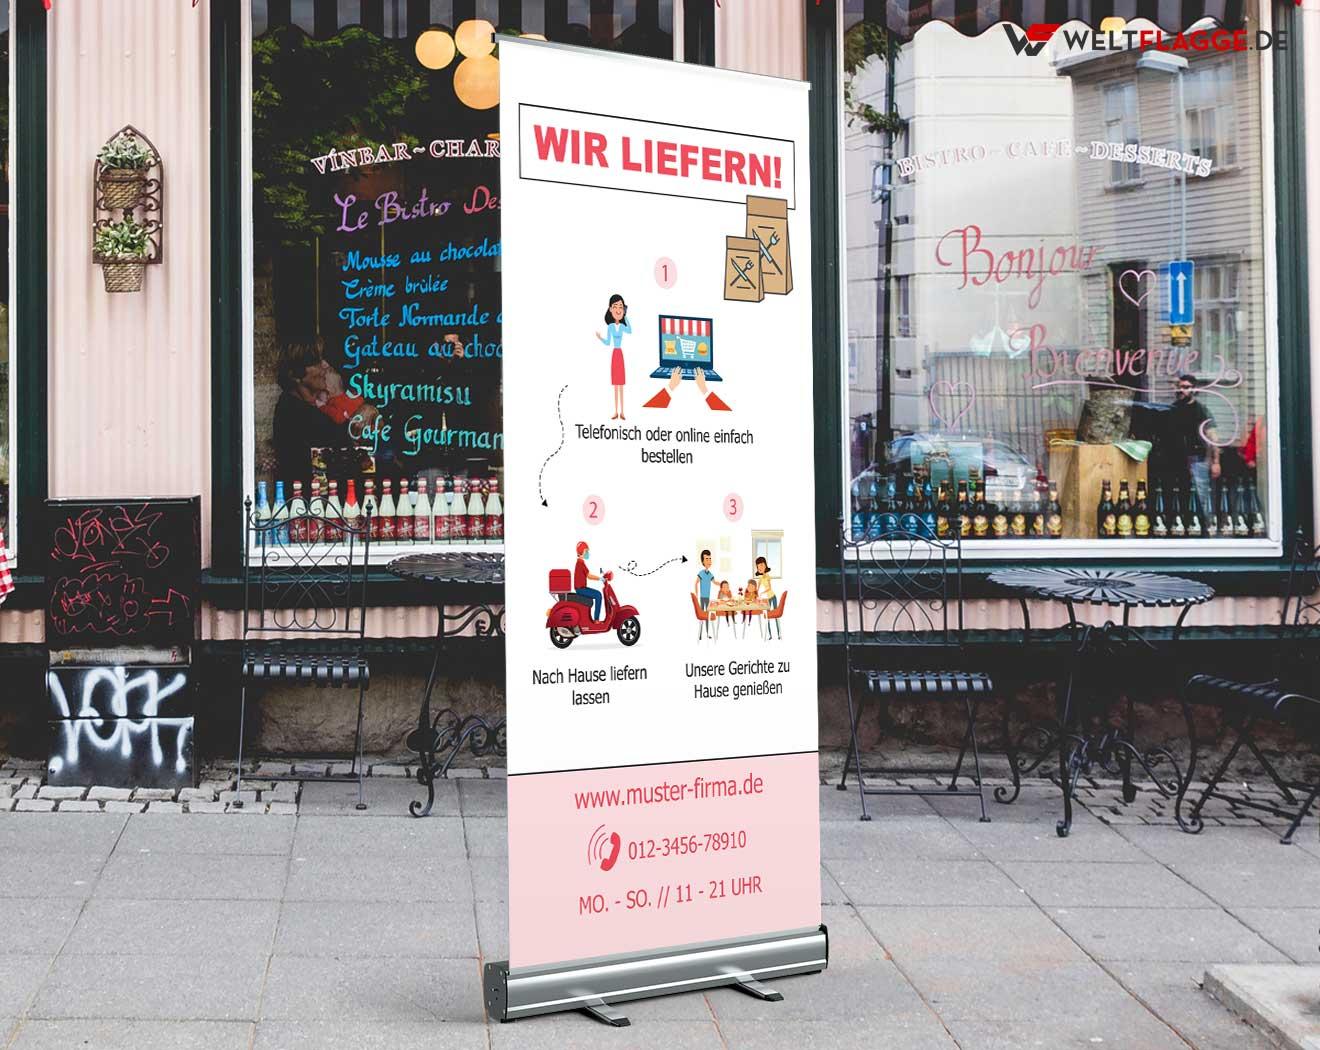 Restaurant Lieferservice Roll-Up Banner bedrucken lassen